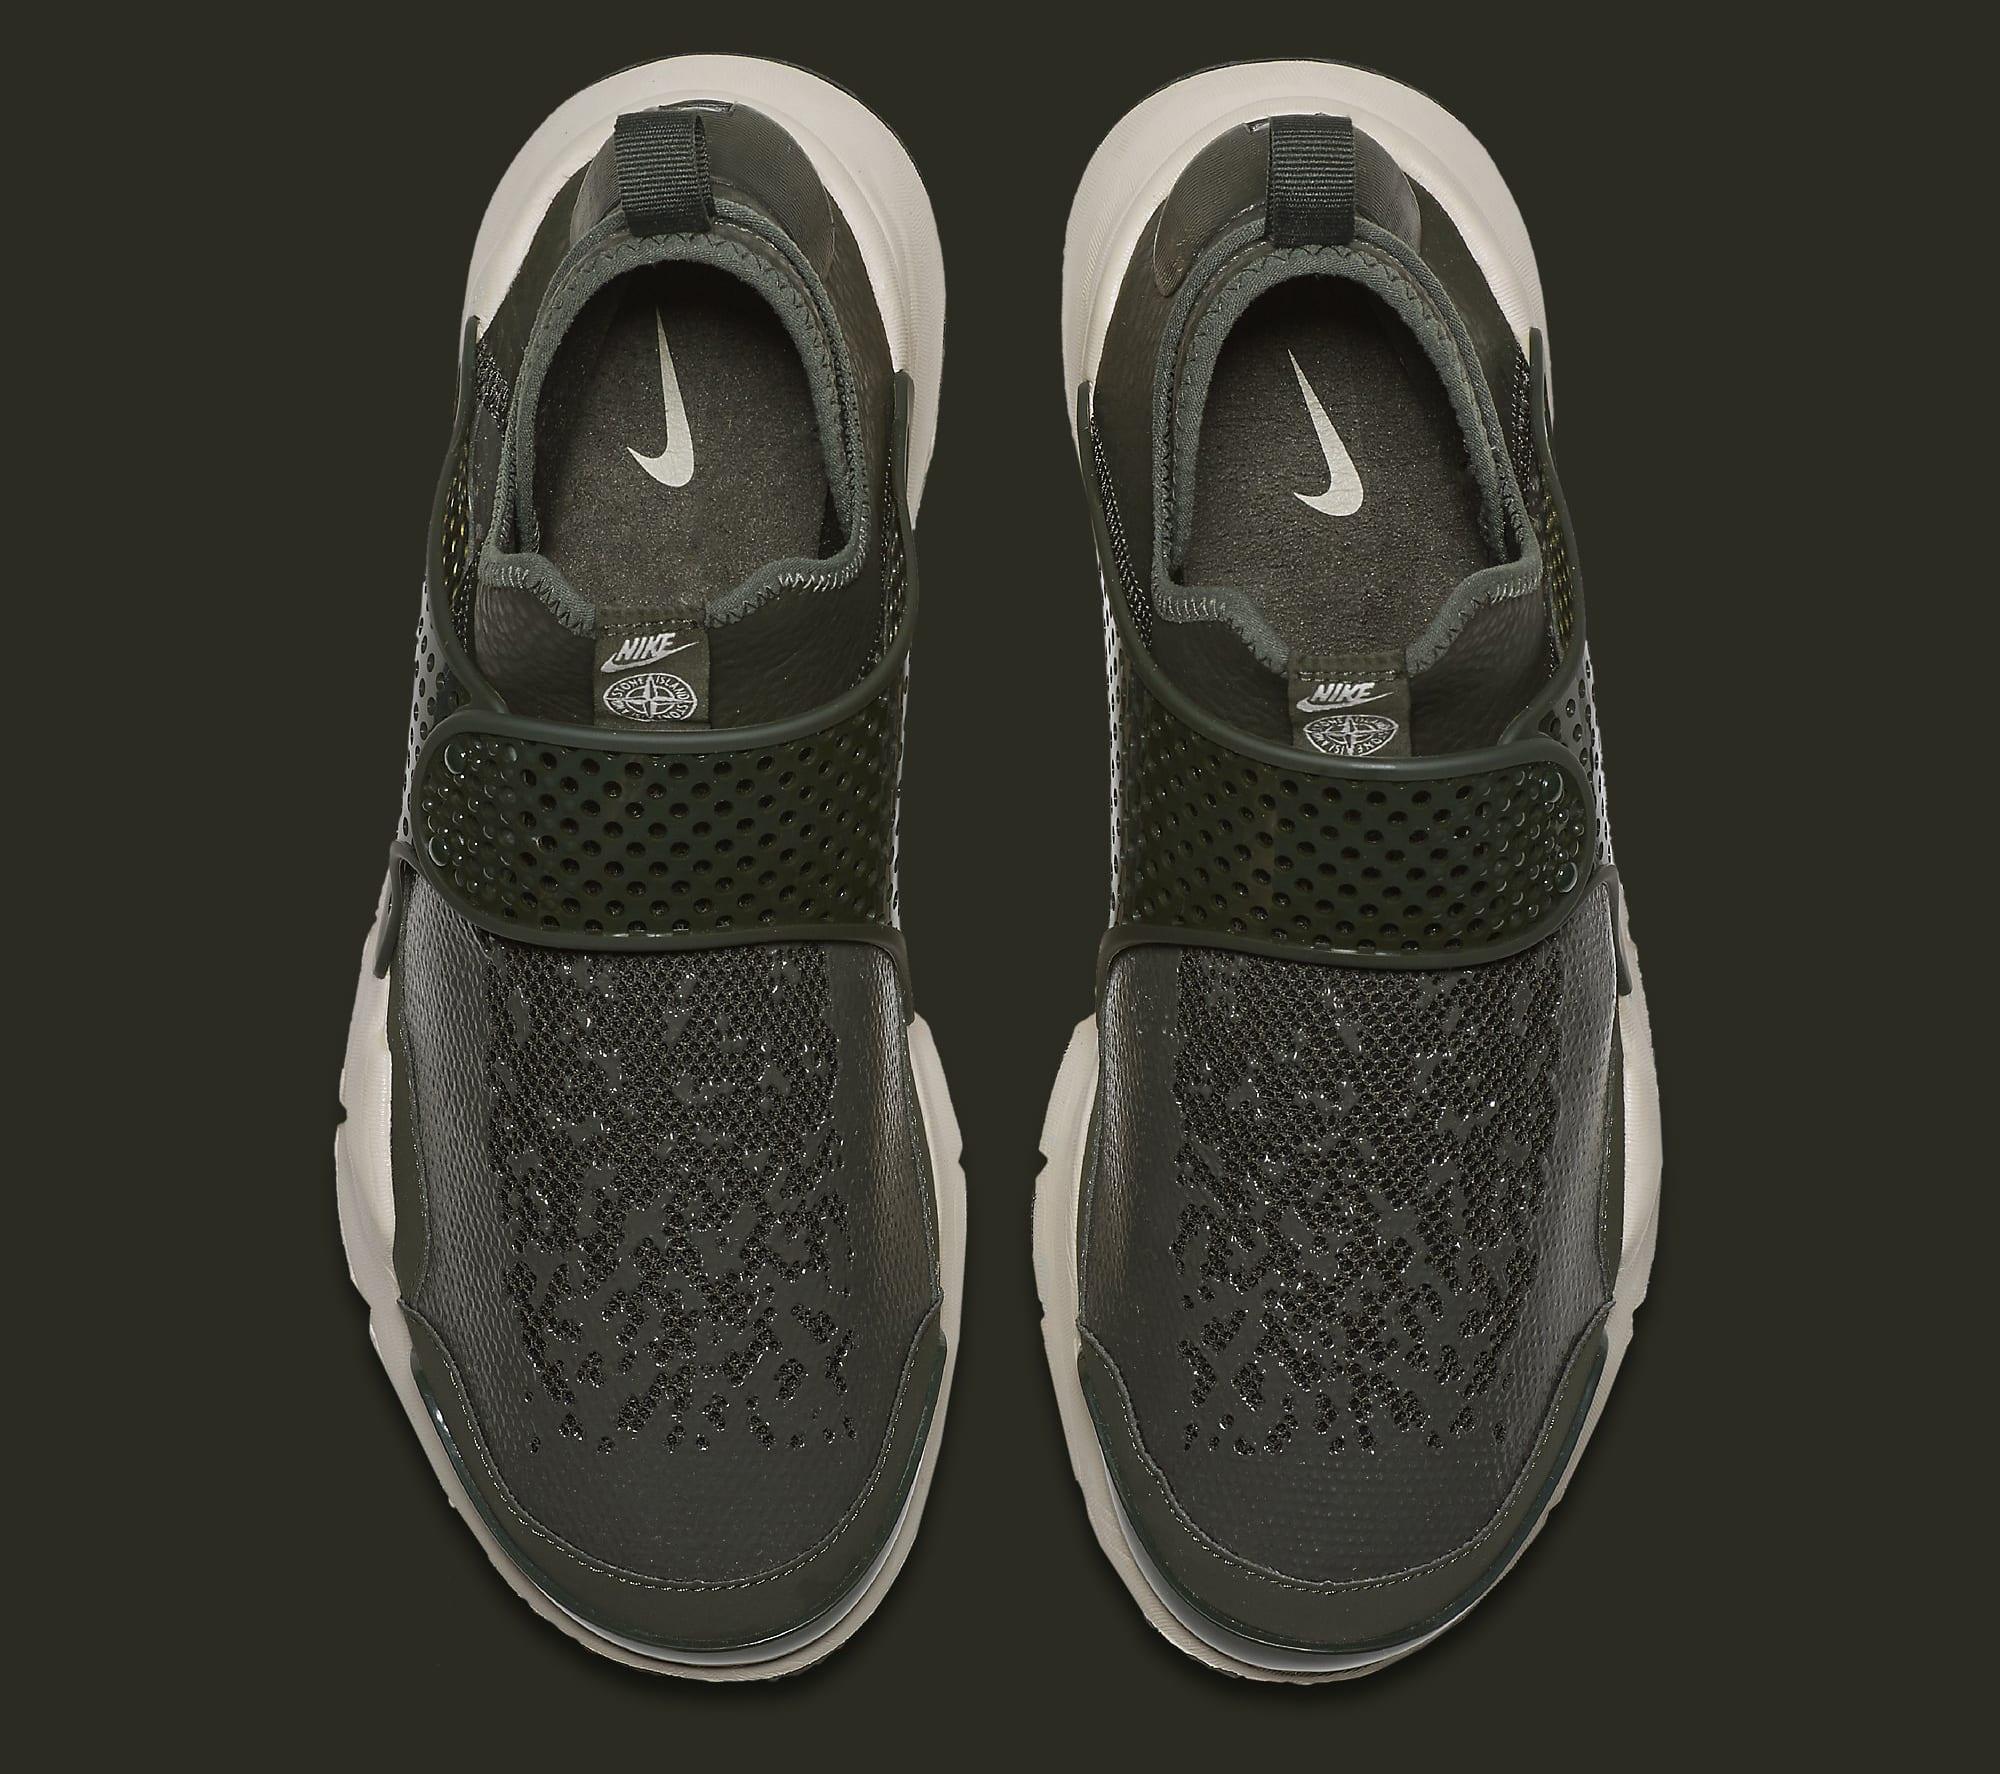 Stone Island Nike Sock Dart 910090-300 Top